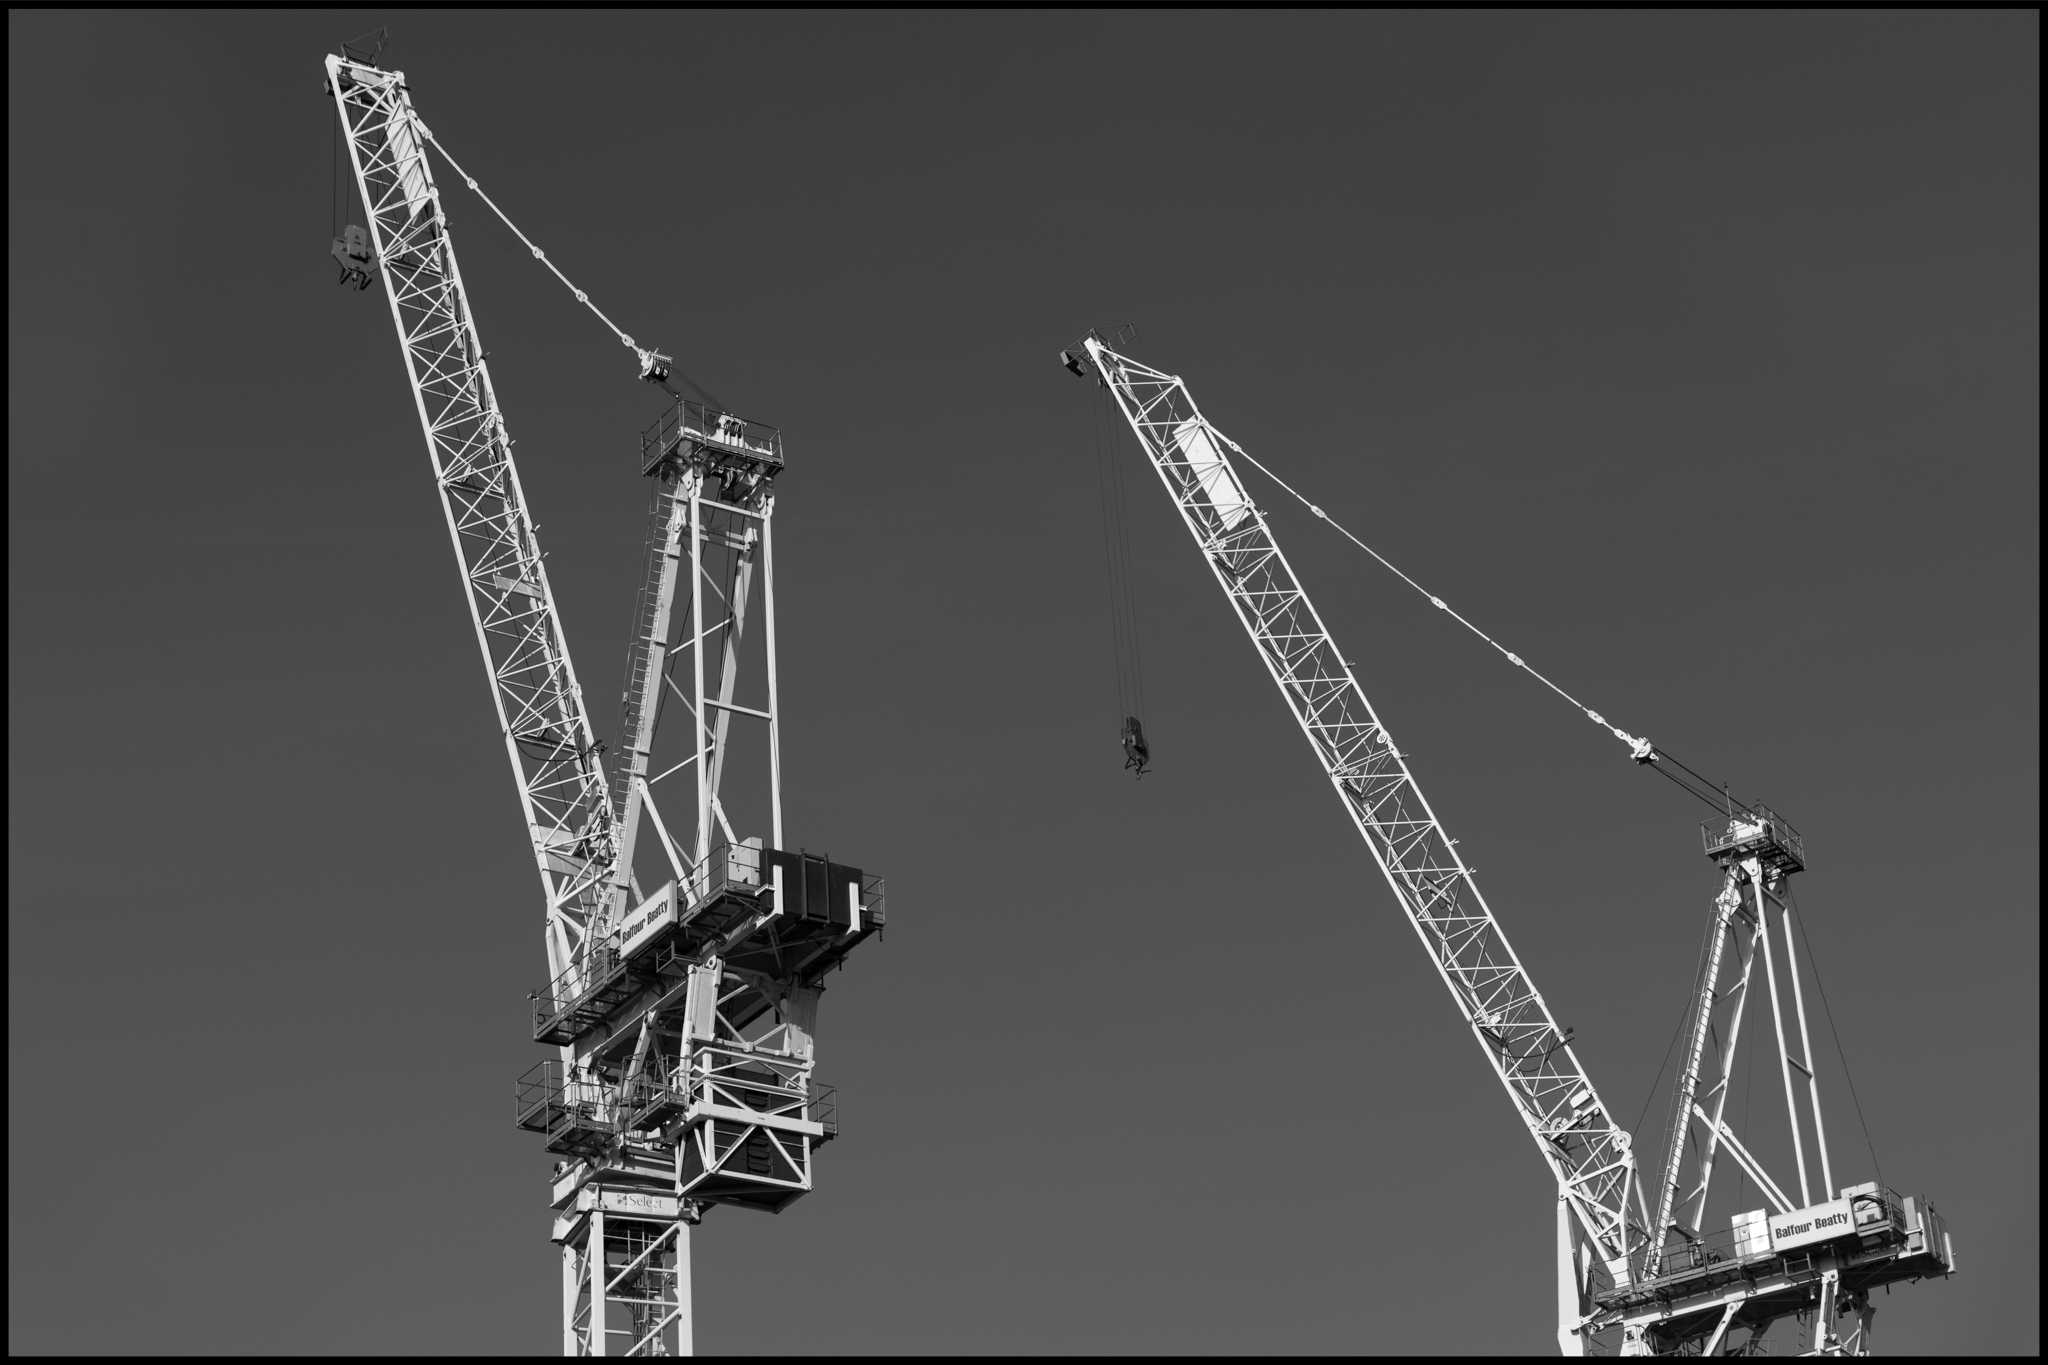 20 June 2019 - Two cranes, Manchester UK